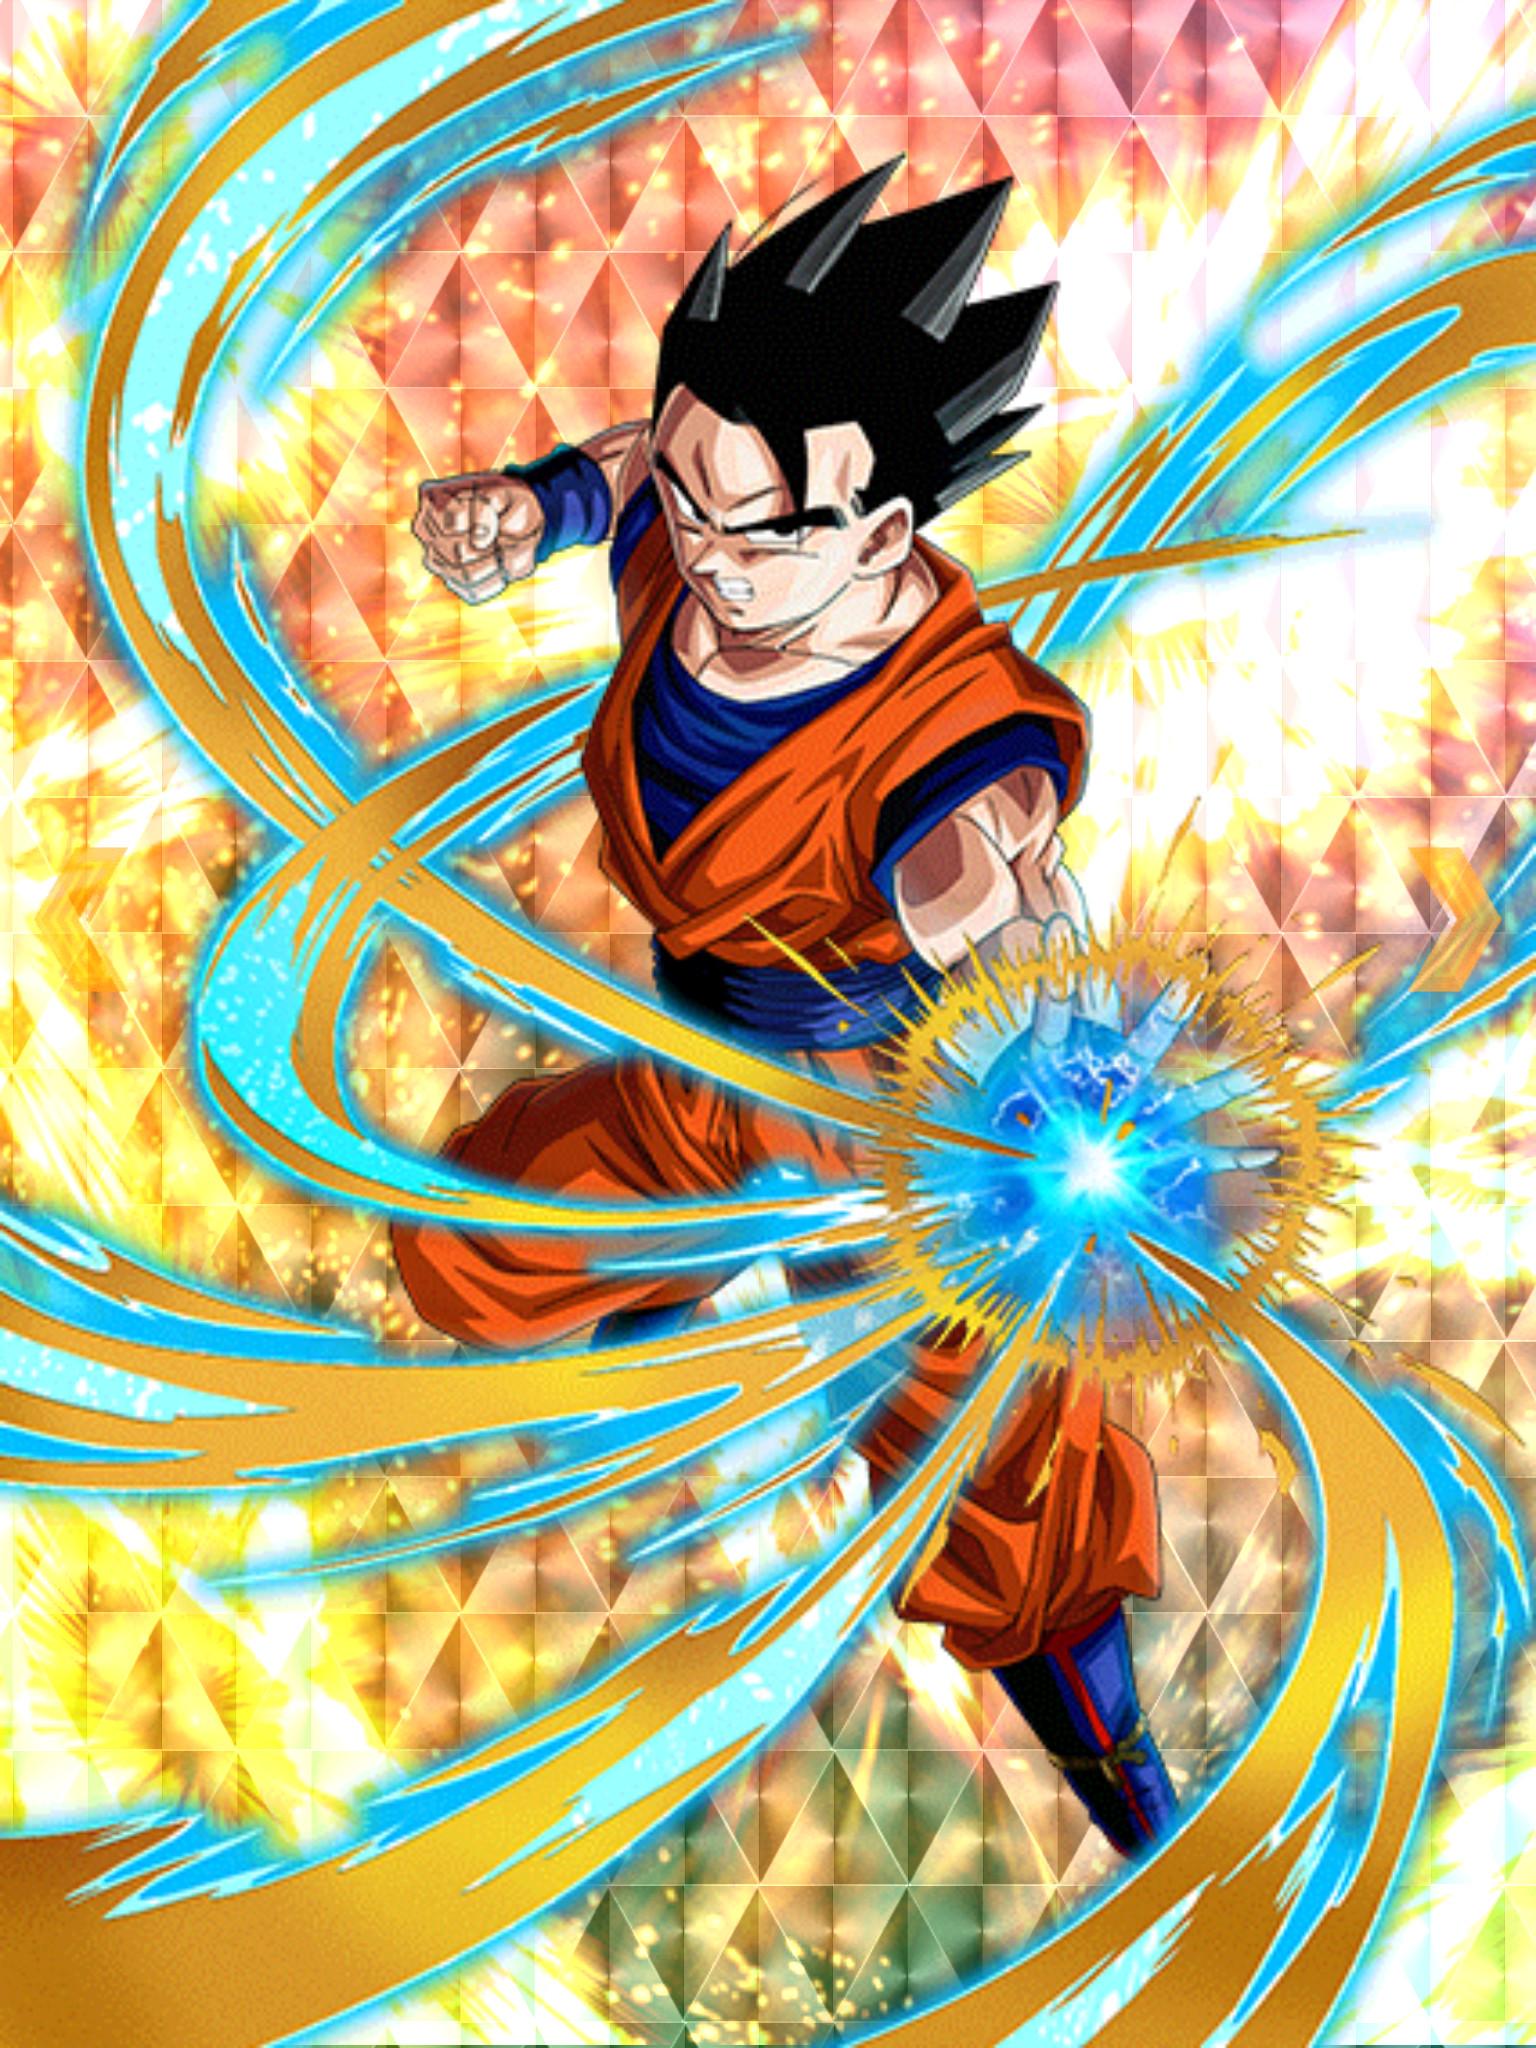 Res: 1536x2048, [Power Awakened] Ultimate Gohan/Dragon Ball Z: Dokkan Battle